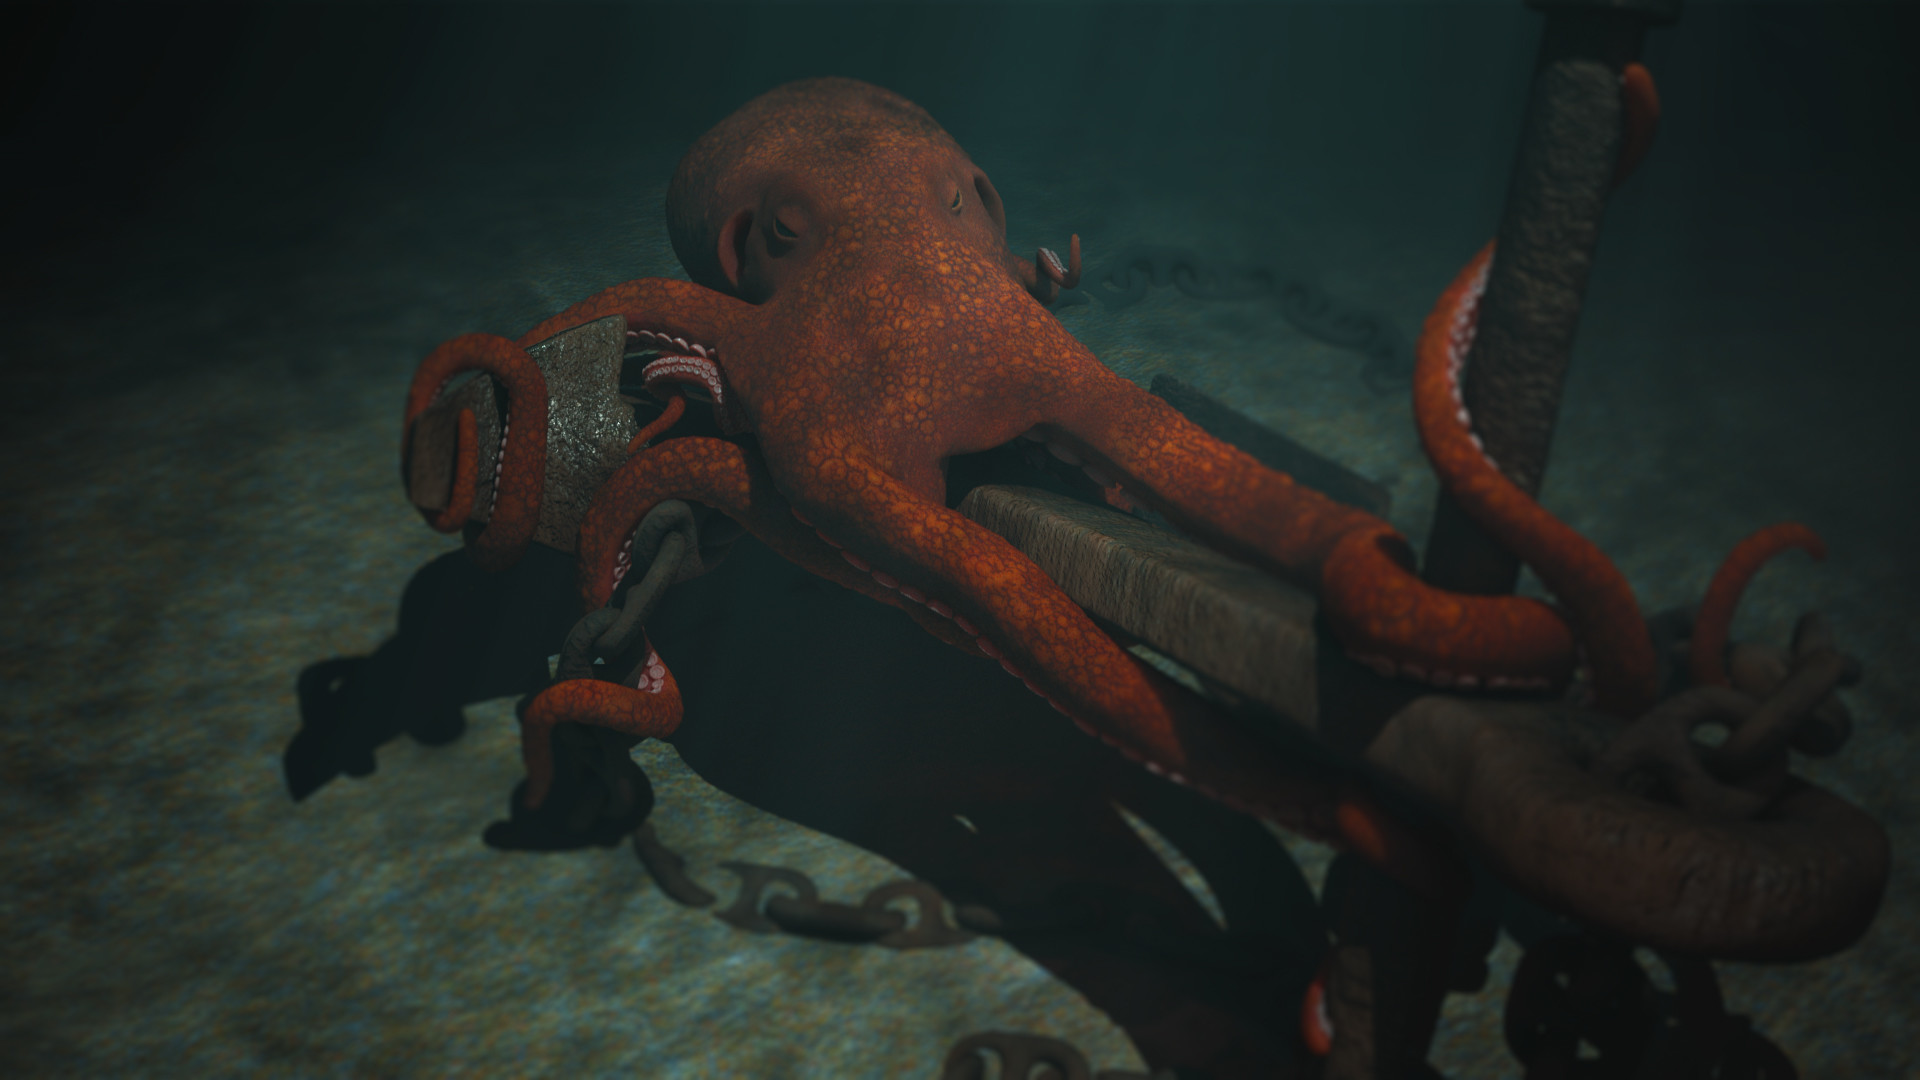 Josh mccann octopus 002